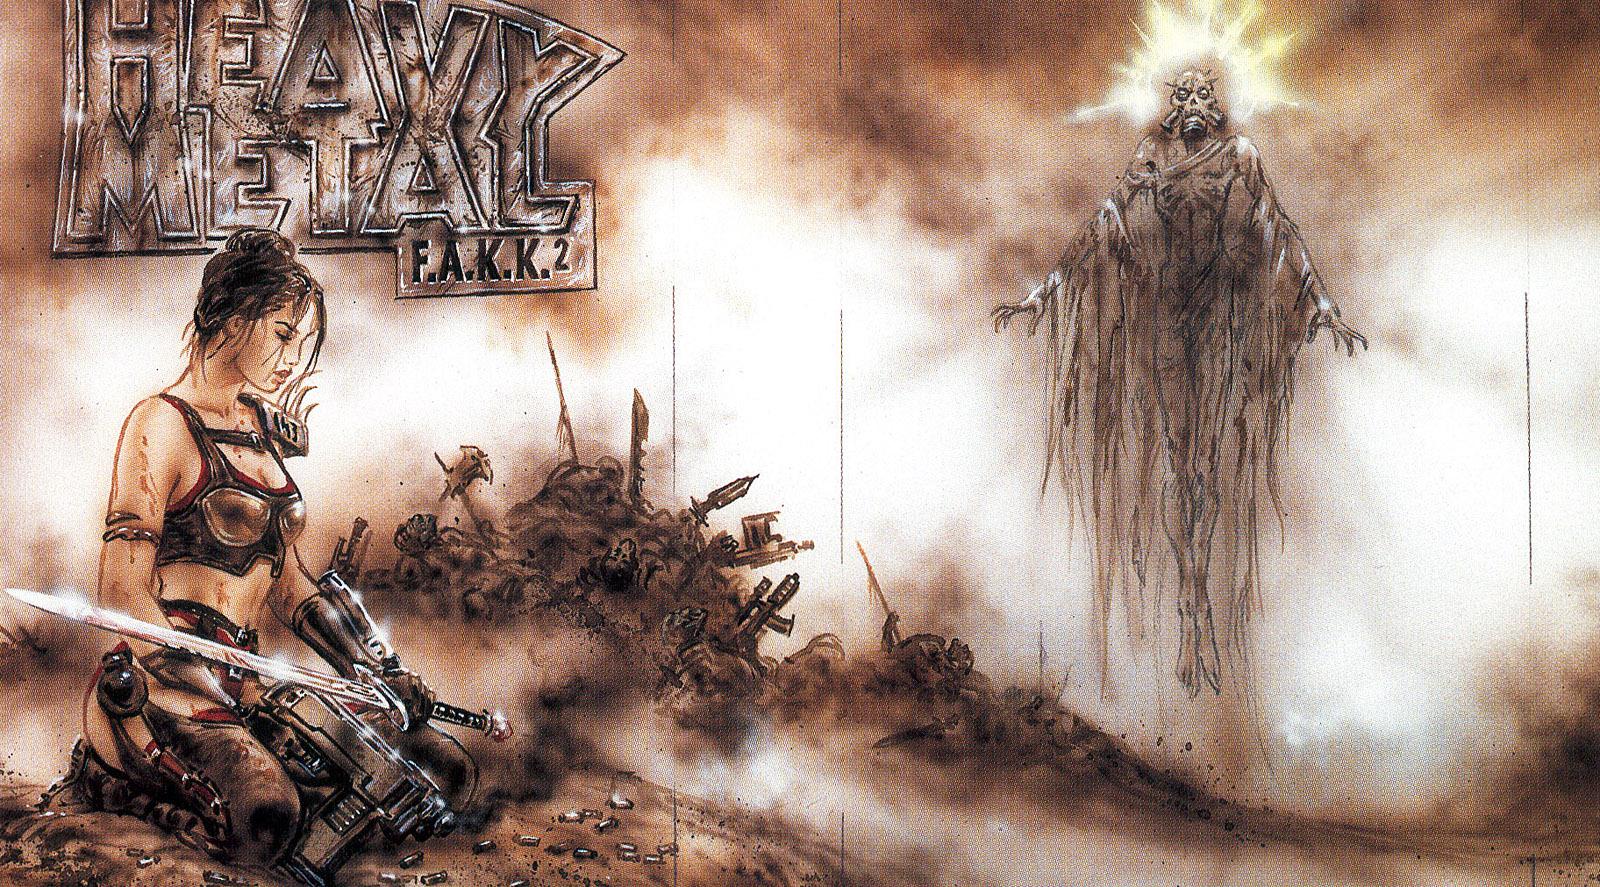 Арт к игре Heavy Metal: F.A.K.K. 2